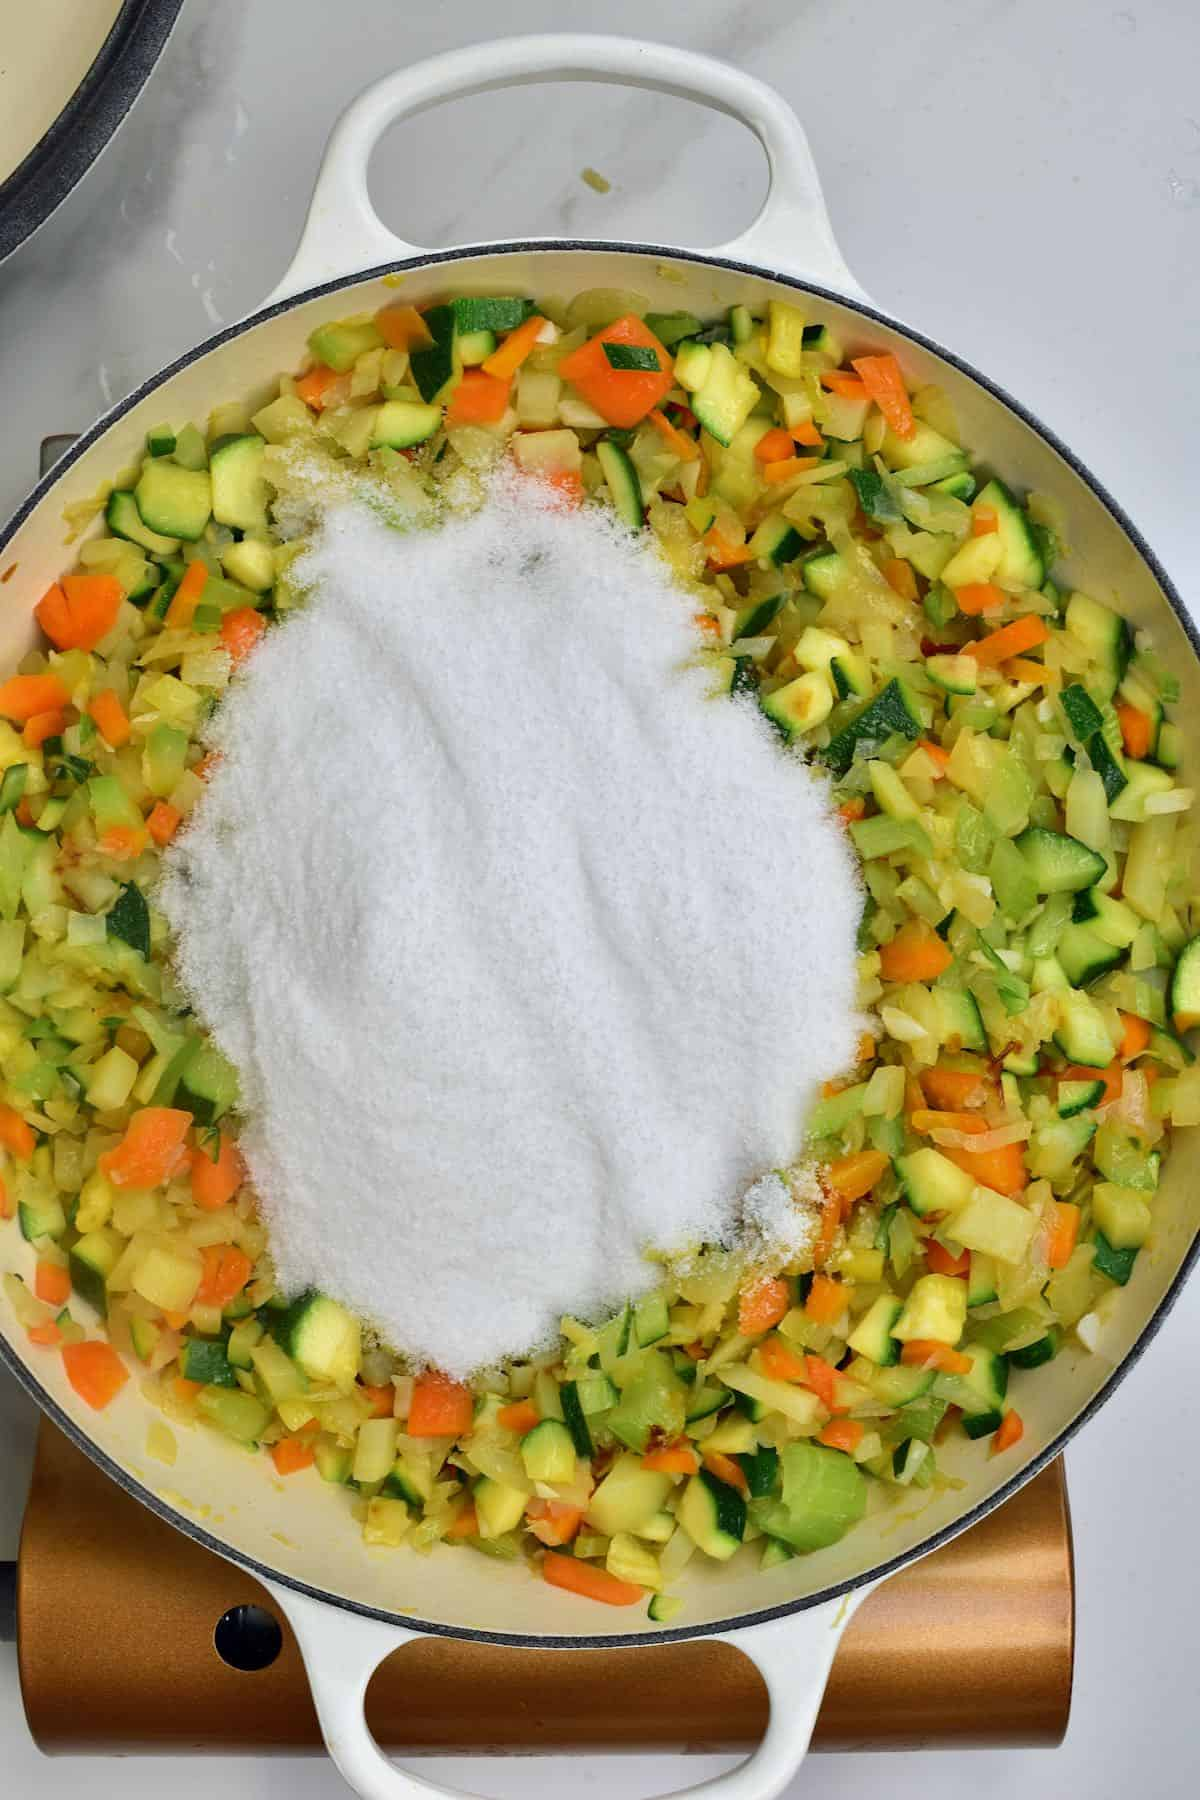 Salt added to cooked vegetables